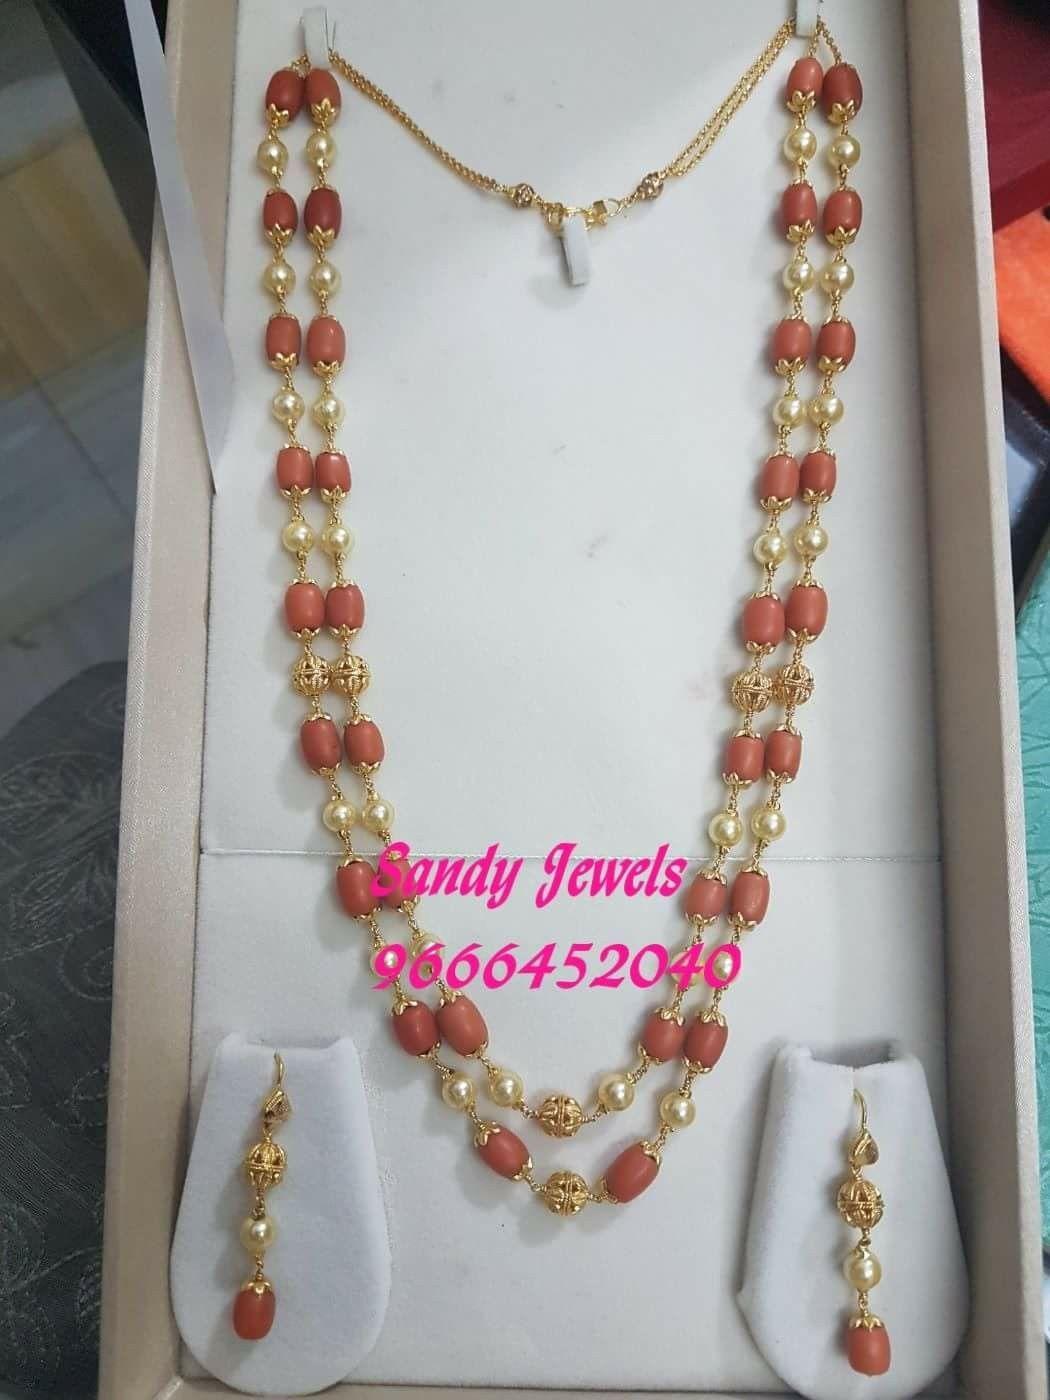 Pin by raghavi on jewellery pinterest india jewelry indian